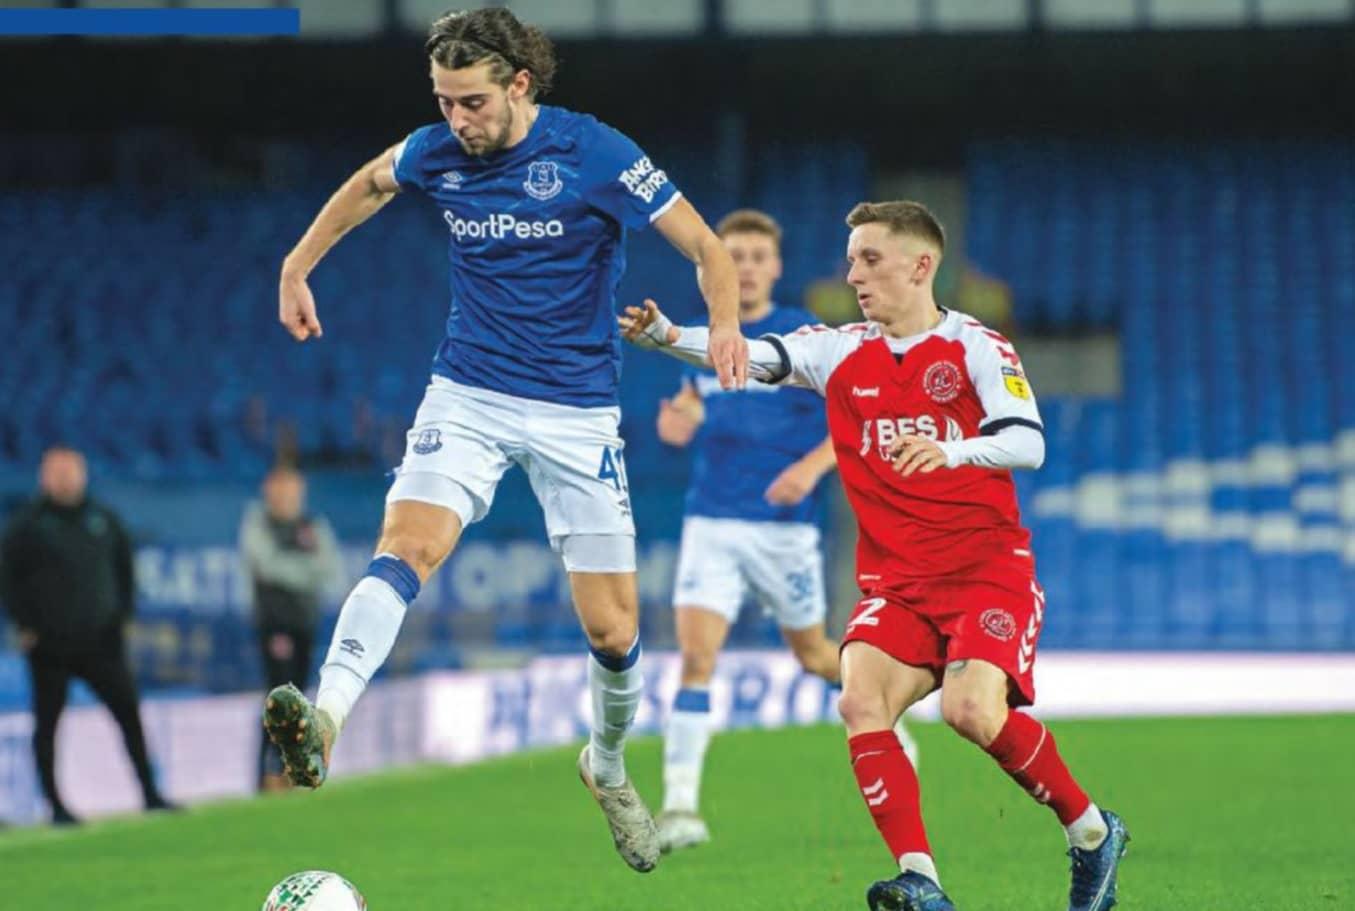 'Top talent' Evans reaping rewards of hard graft